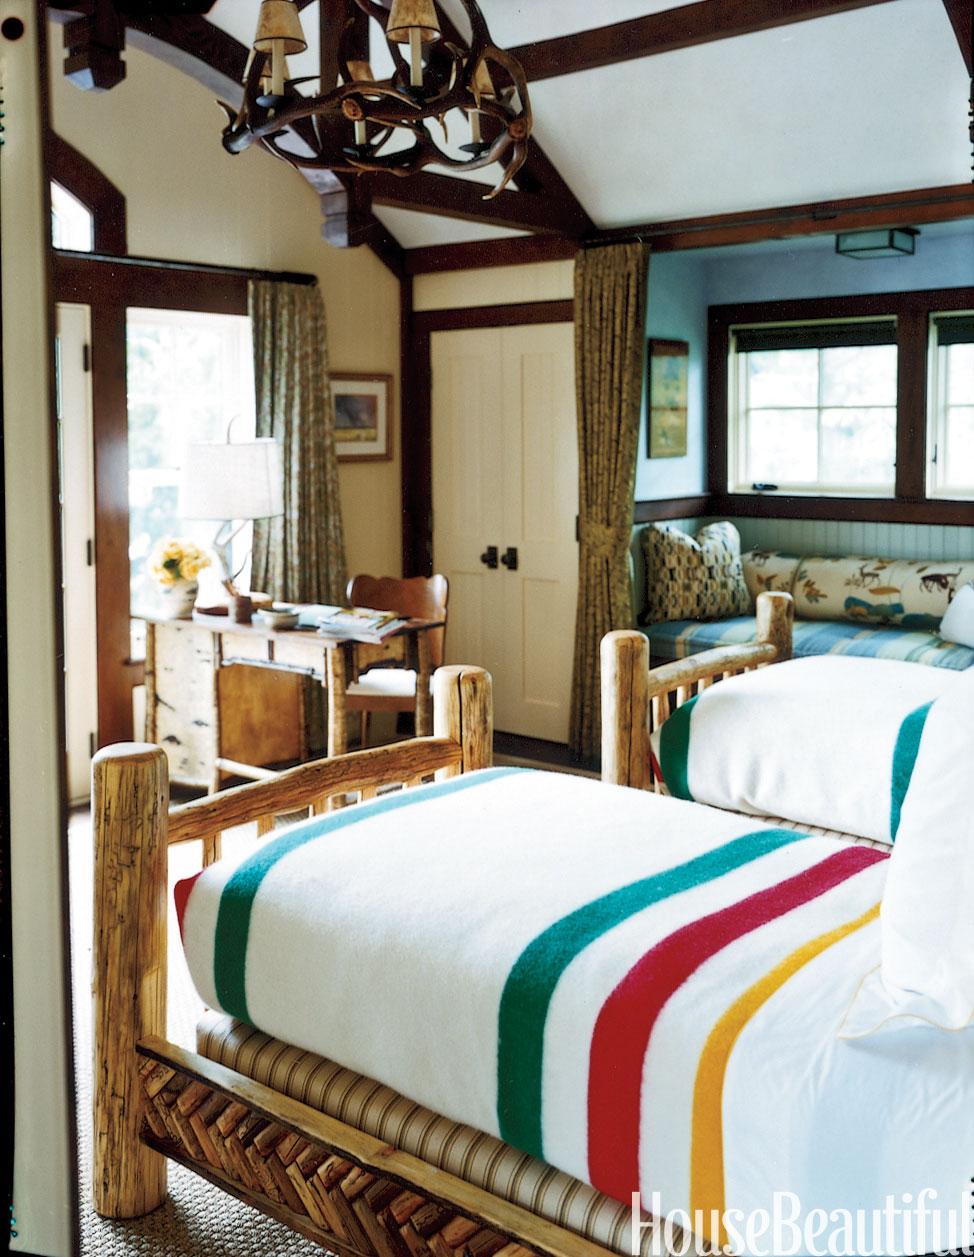 25 cozy bedroom ideas how to make your bedroom feel cozy